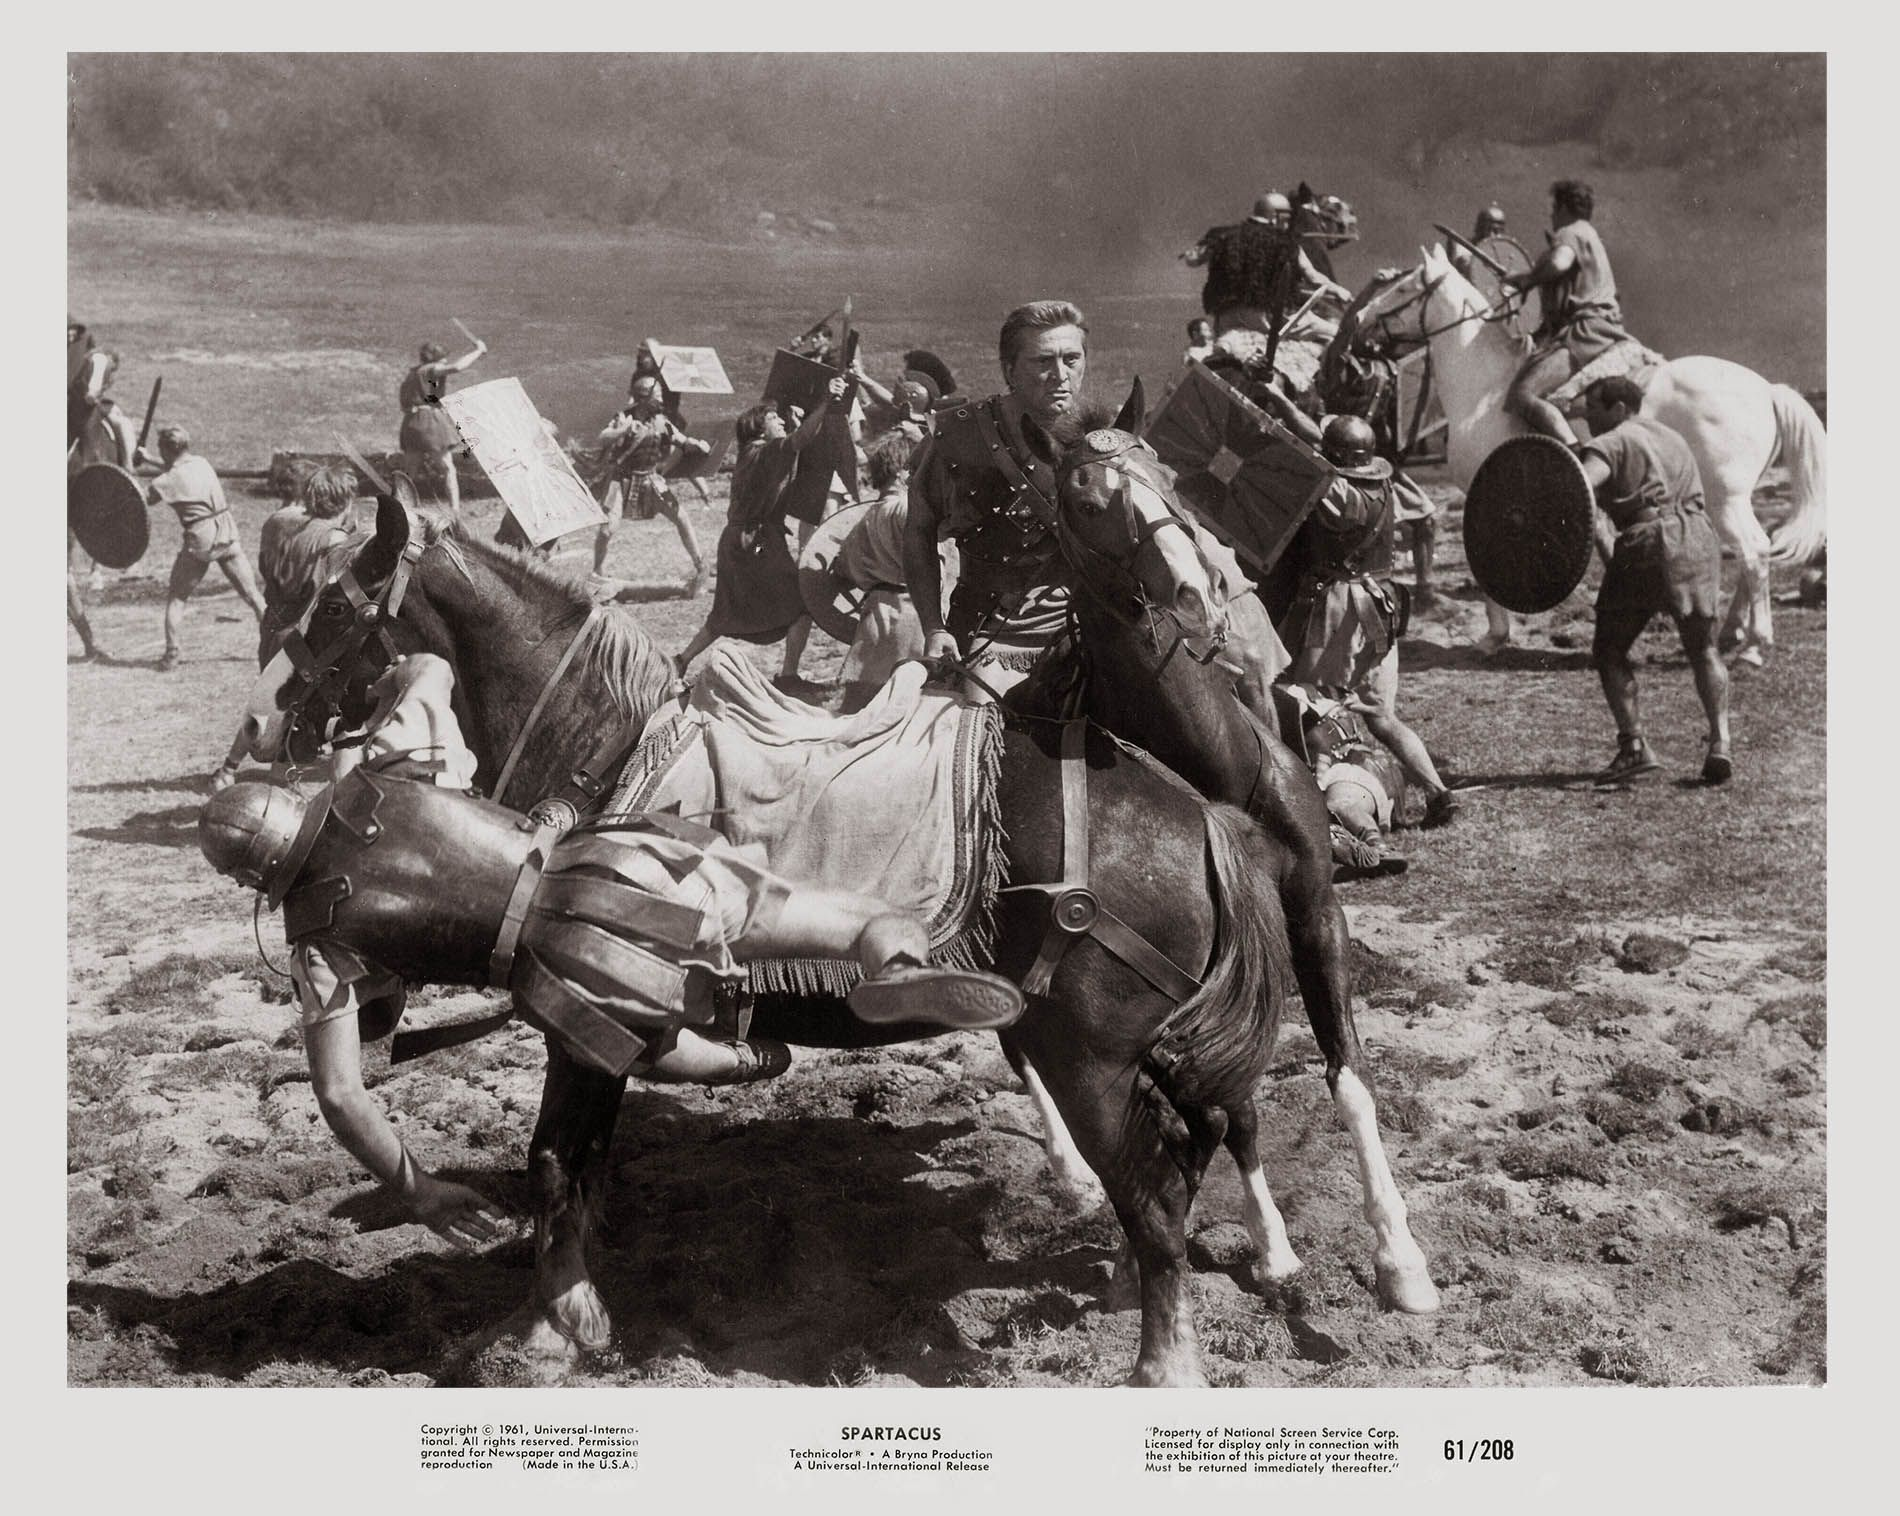 1960 film spartacus Spartacus (1960) awards, nominations and wins including academy awards, golden globes, sundance film festival awards, mtv movie awards and more.